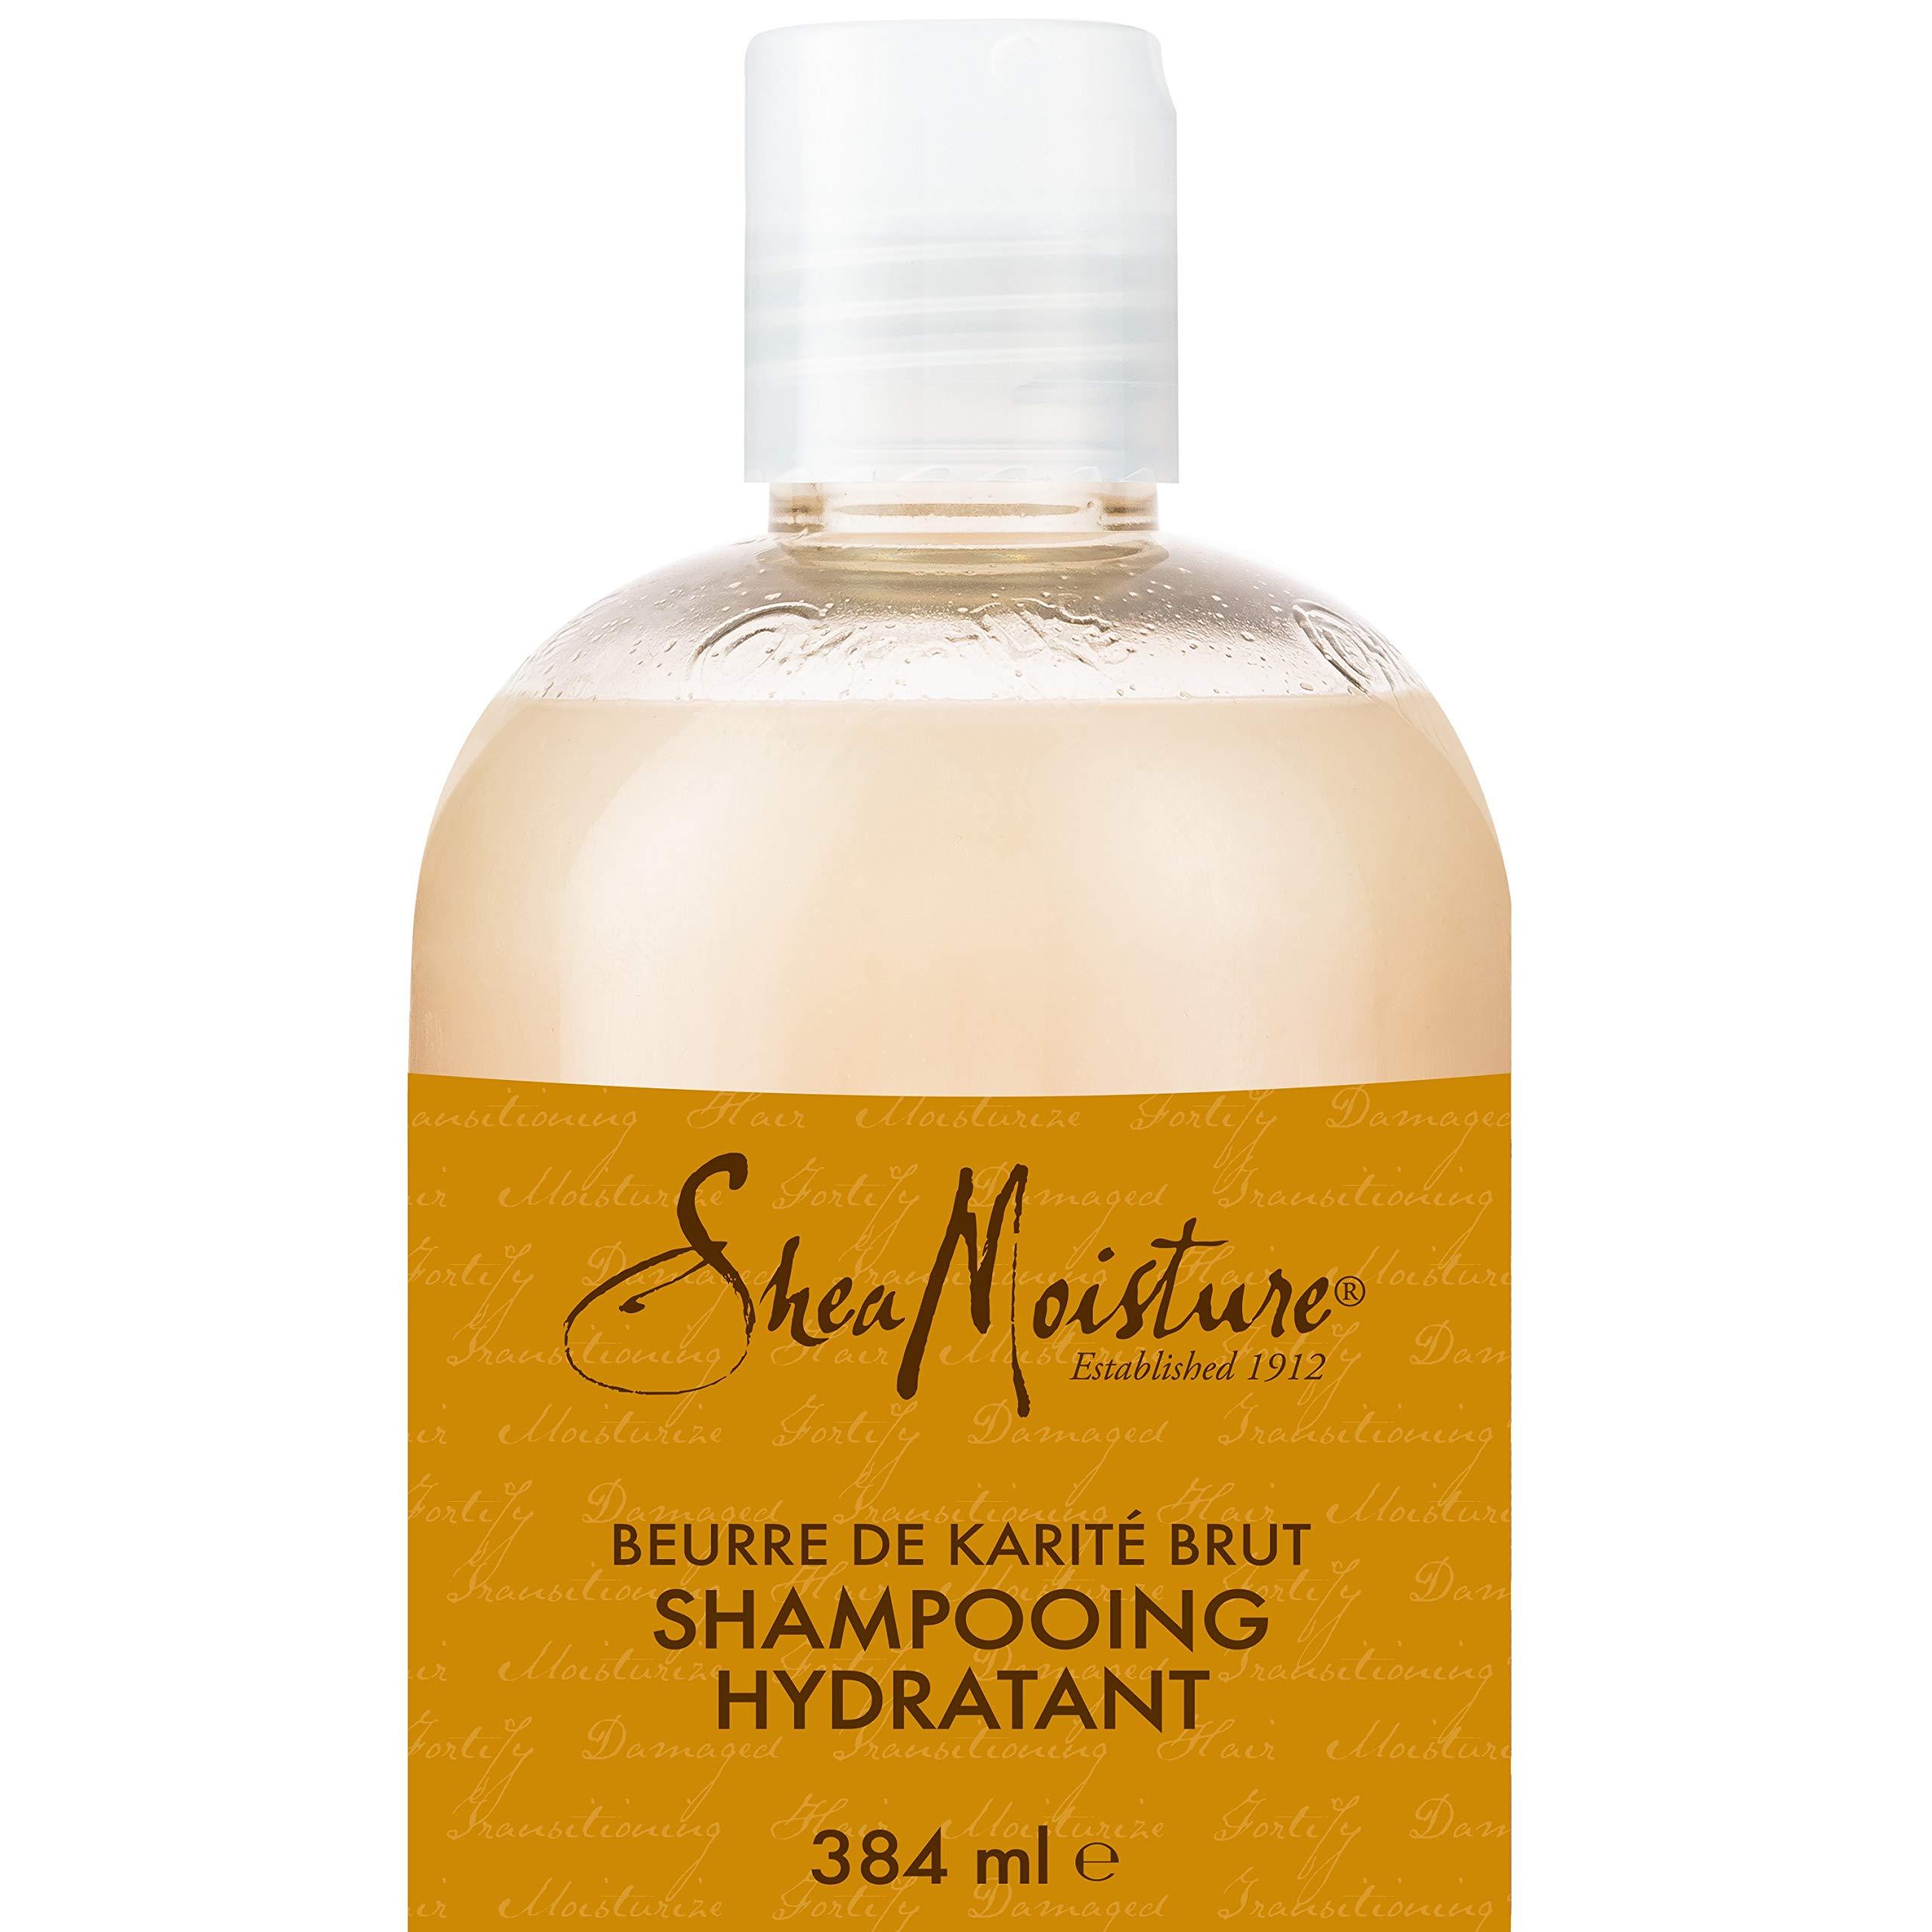 Shea Moisture Raw Shea Butter Moisture Retention Shampoo, 379 ml